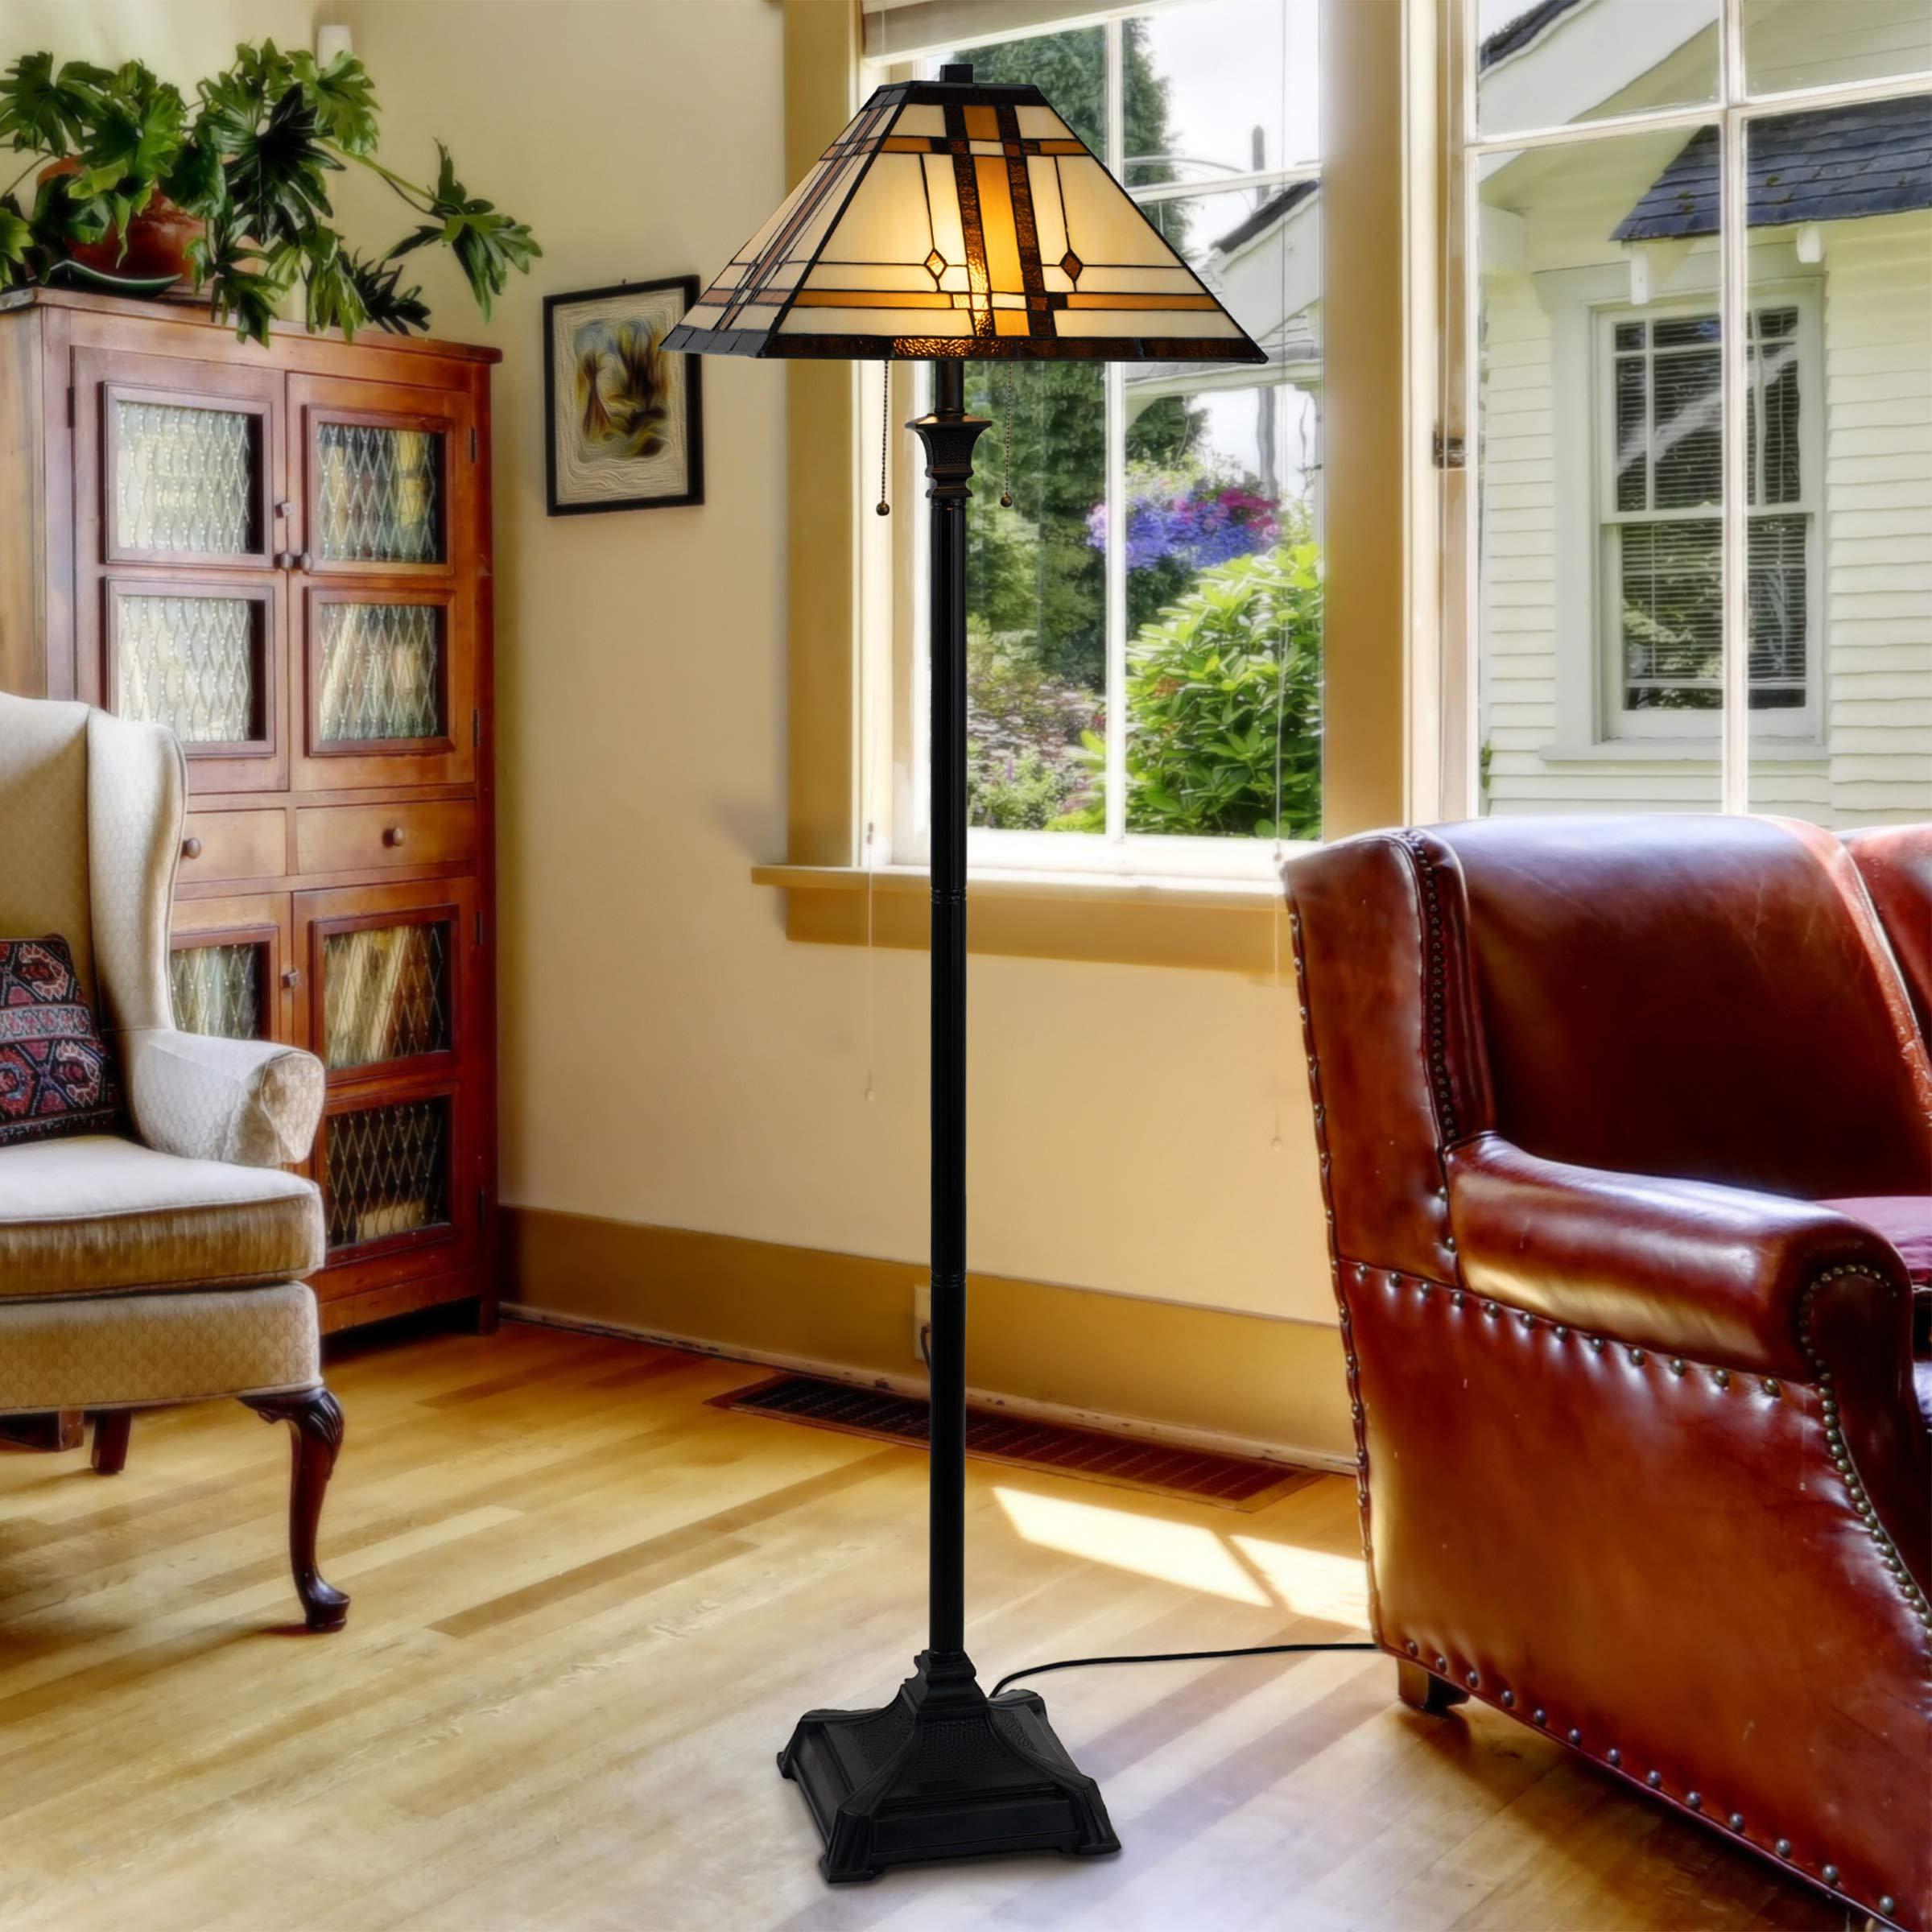 Lavish-Home-72-Tiff-7-Tiffany-Style-Floor-Lamp-1 15 Unique Artistic Floor Lamps to Light Your Bedroom